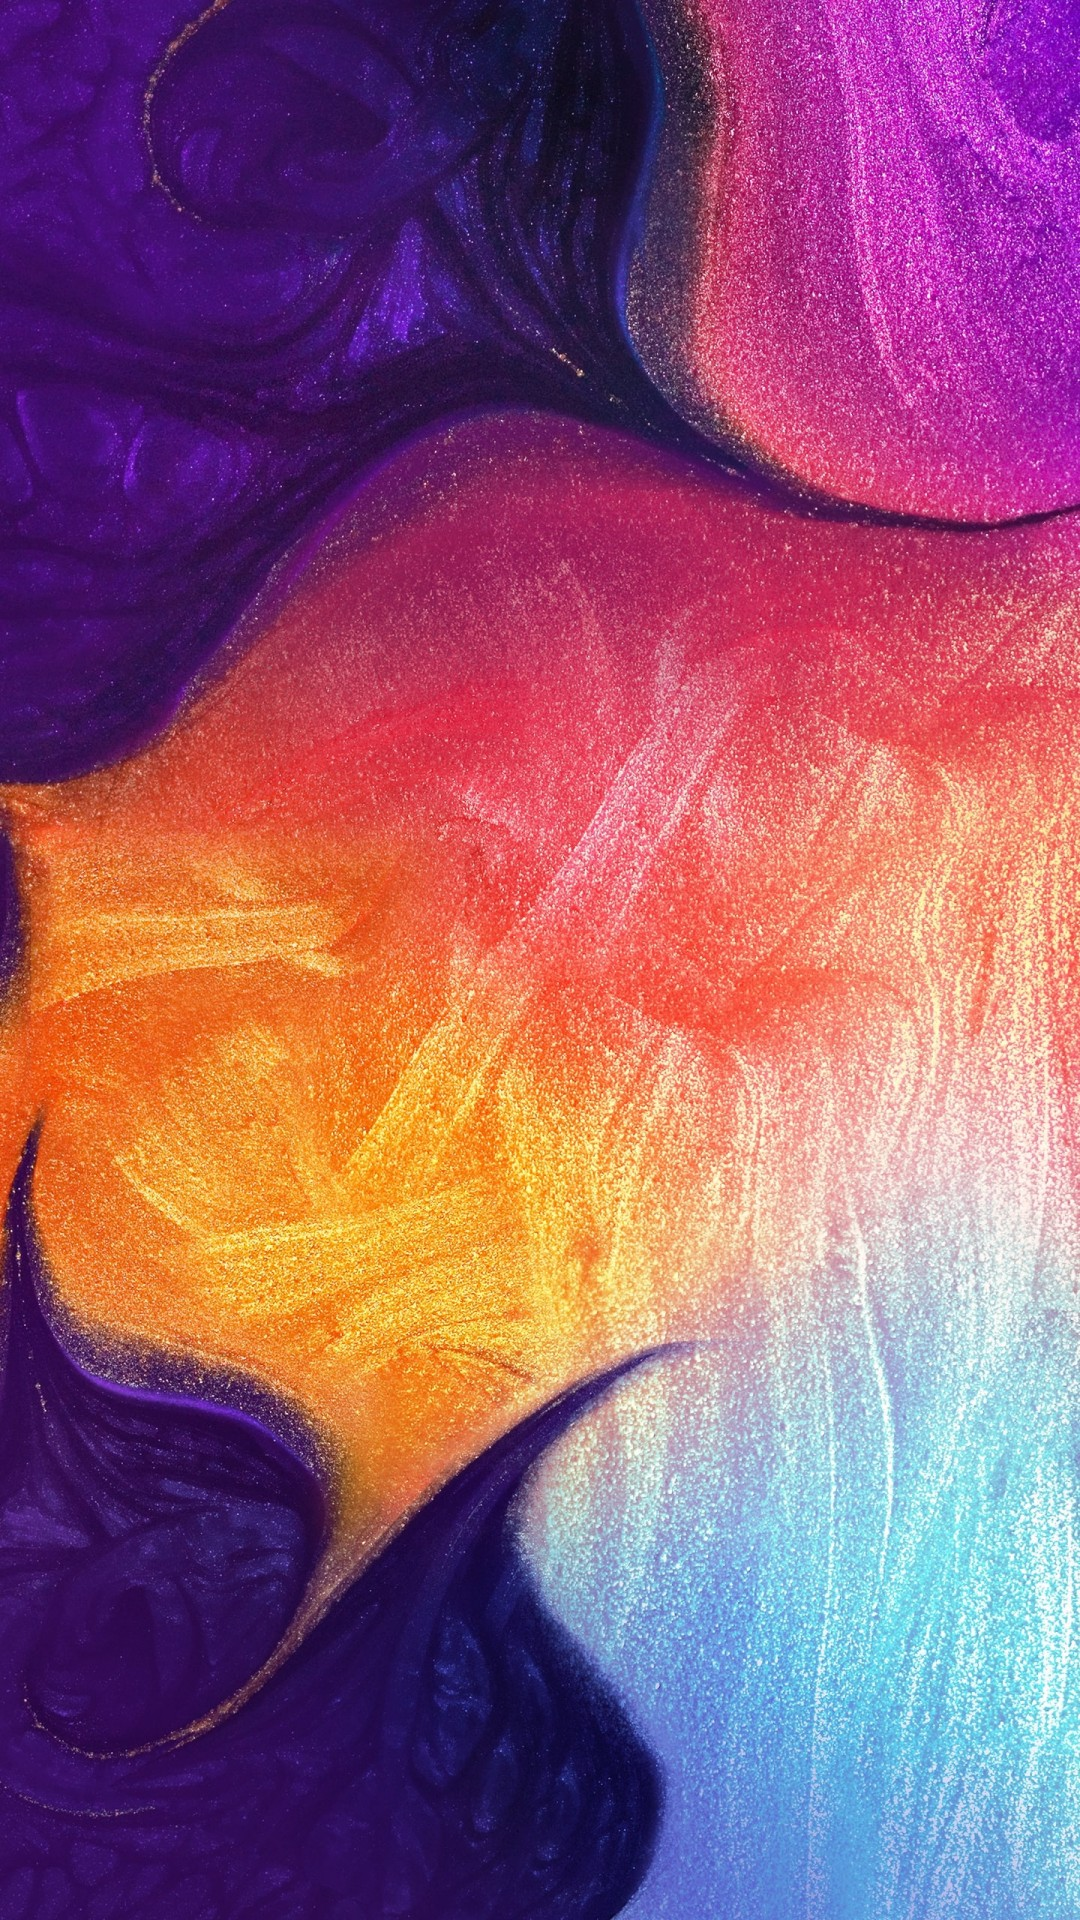 Wallpaper Samsung Galaxy A50 Abstract Colorful Hd Os